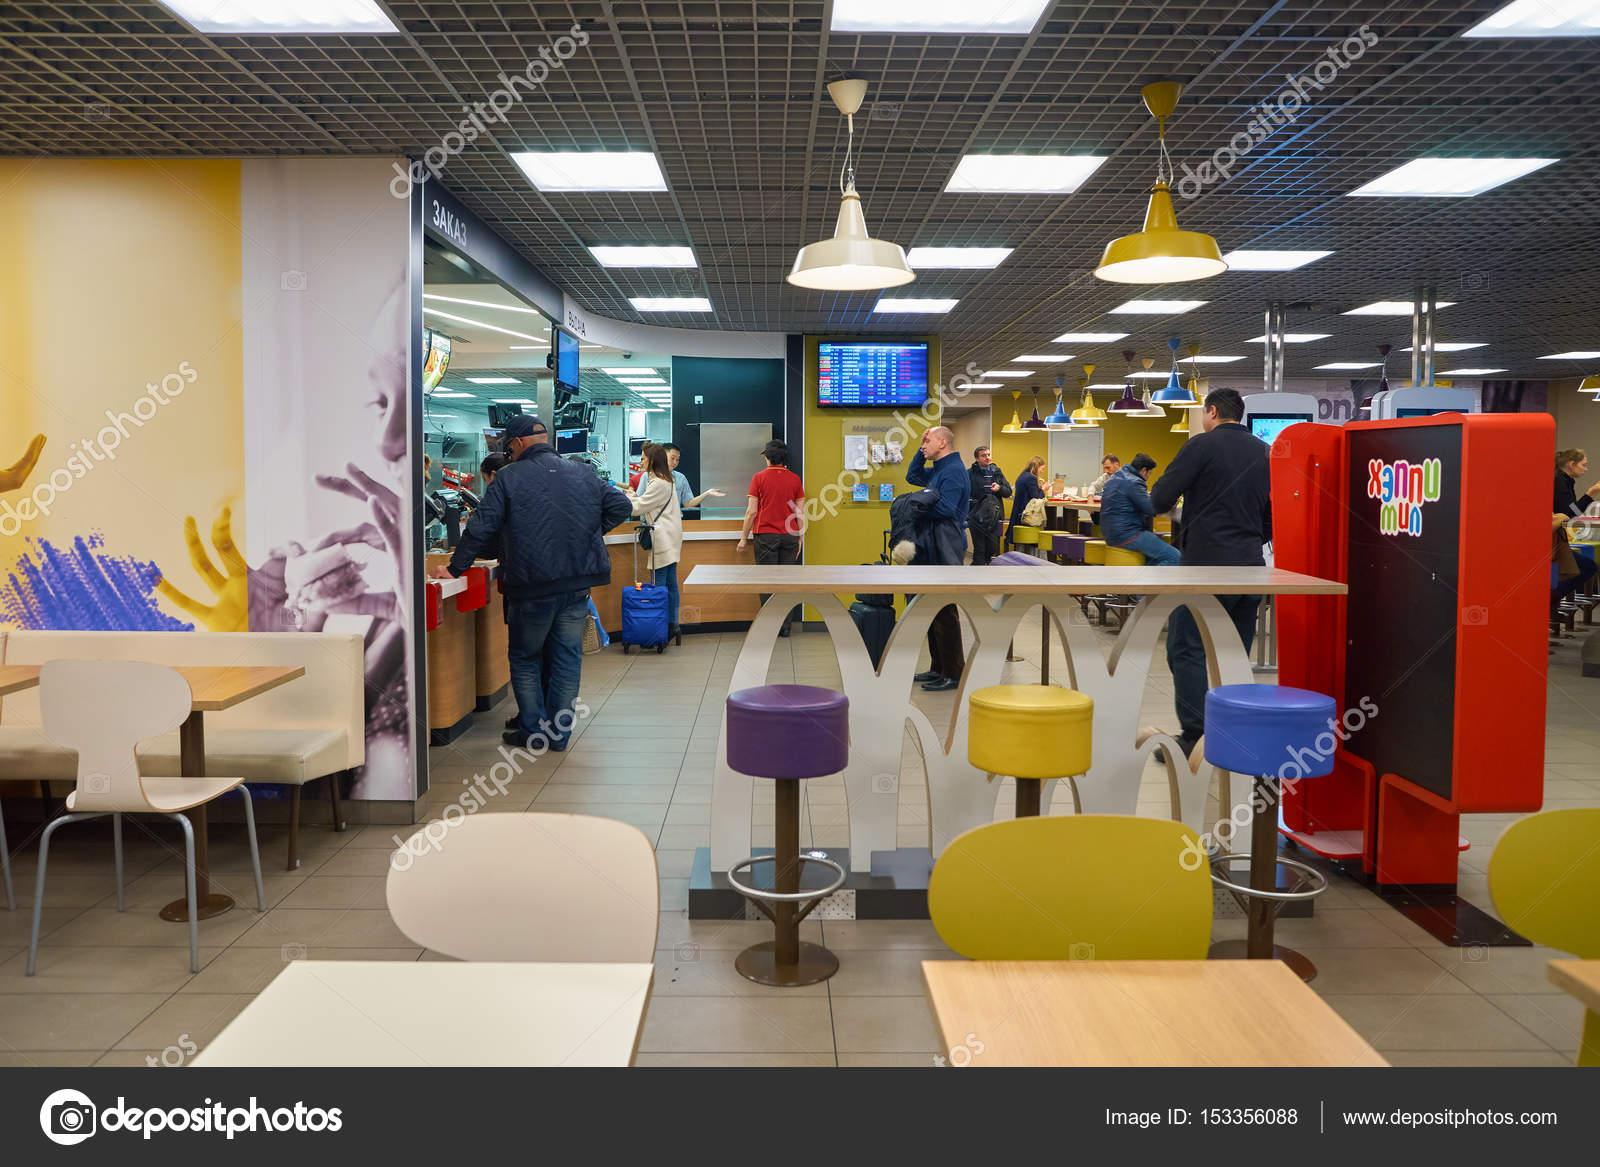 Mcdonald\'s-Restaurant — Redaktionelles Stockfoto © teamtime #153356088